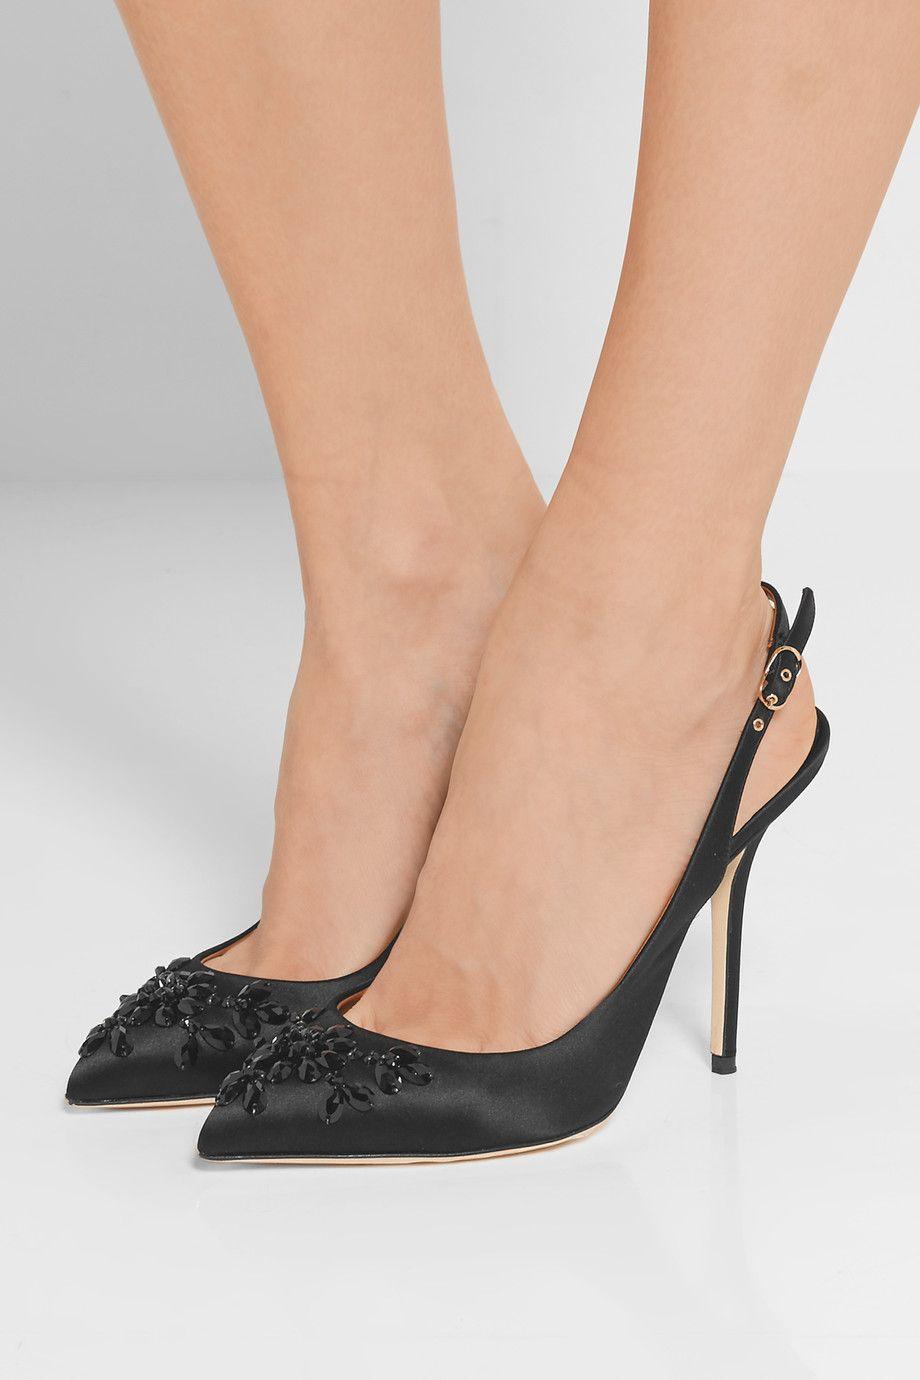 Dolce & Gabbana Embellies Pompes Slingback - Noir GKCUQ4ujQg